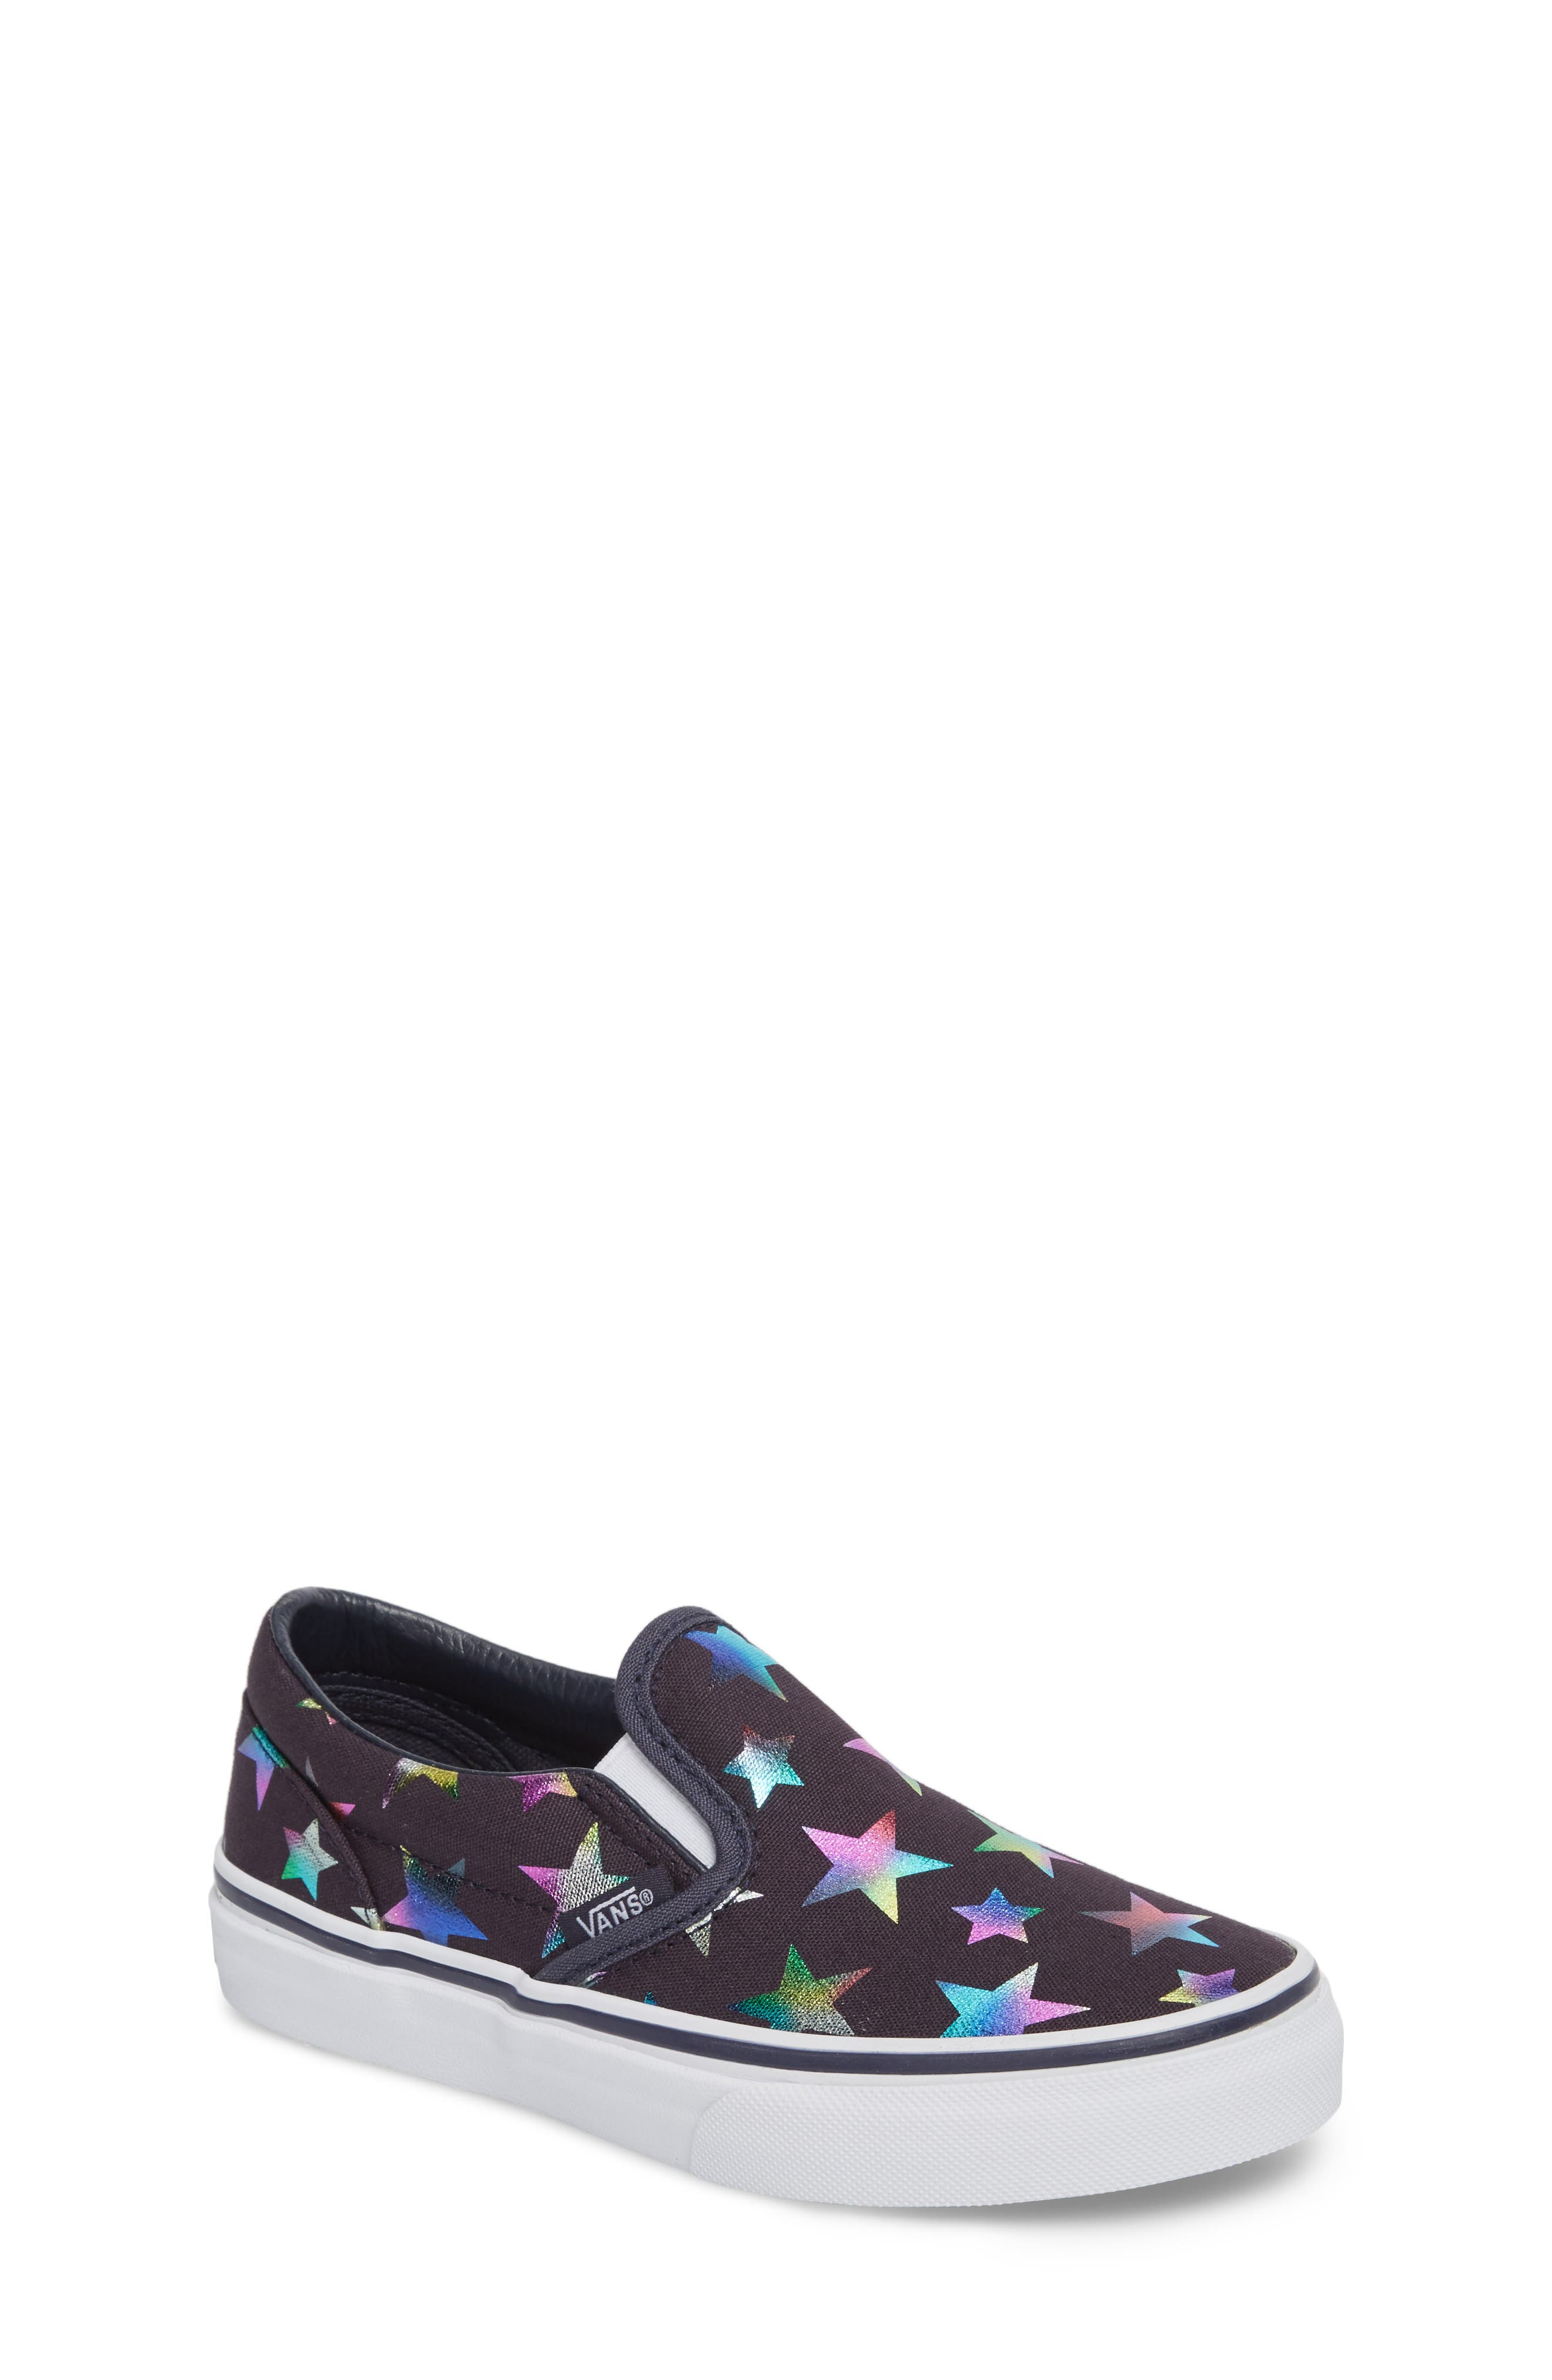 Classic Rainbow Shimmer Star Slip-On Sneaker,                         Main,                         color, Parisian Night Foil Stars